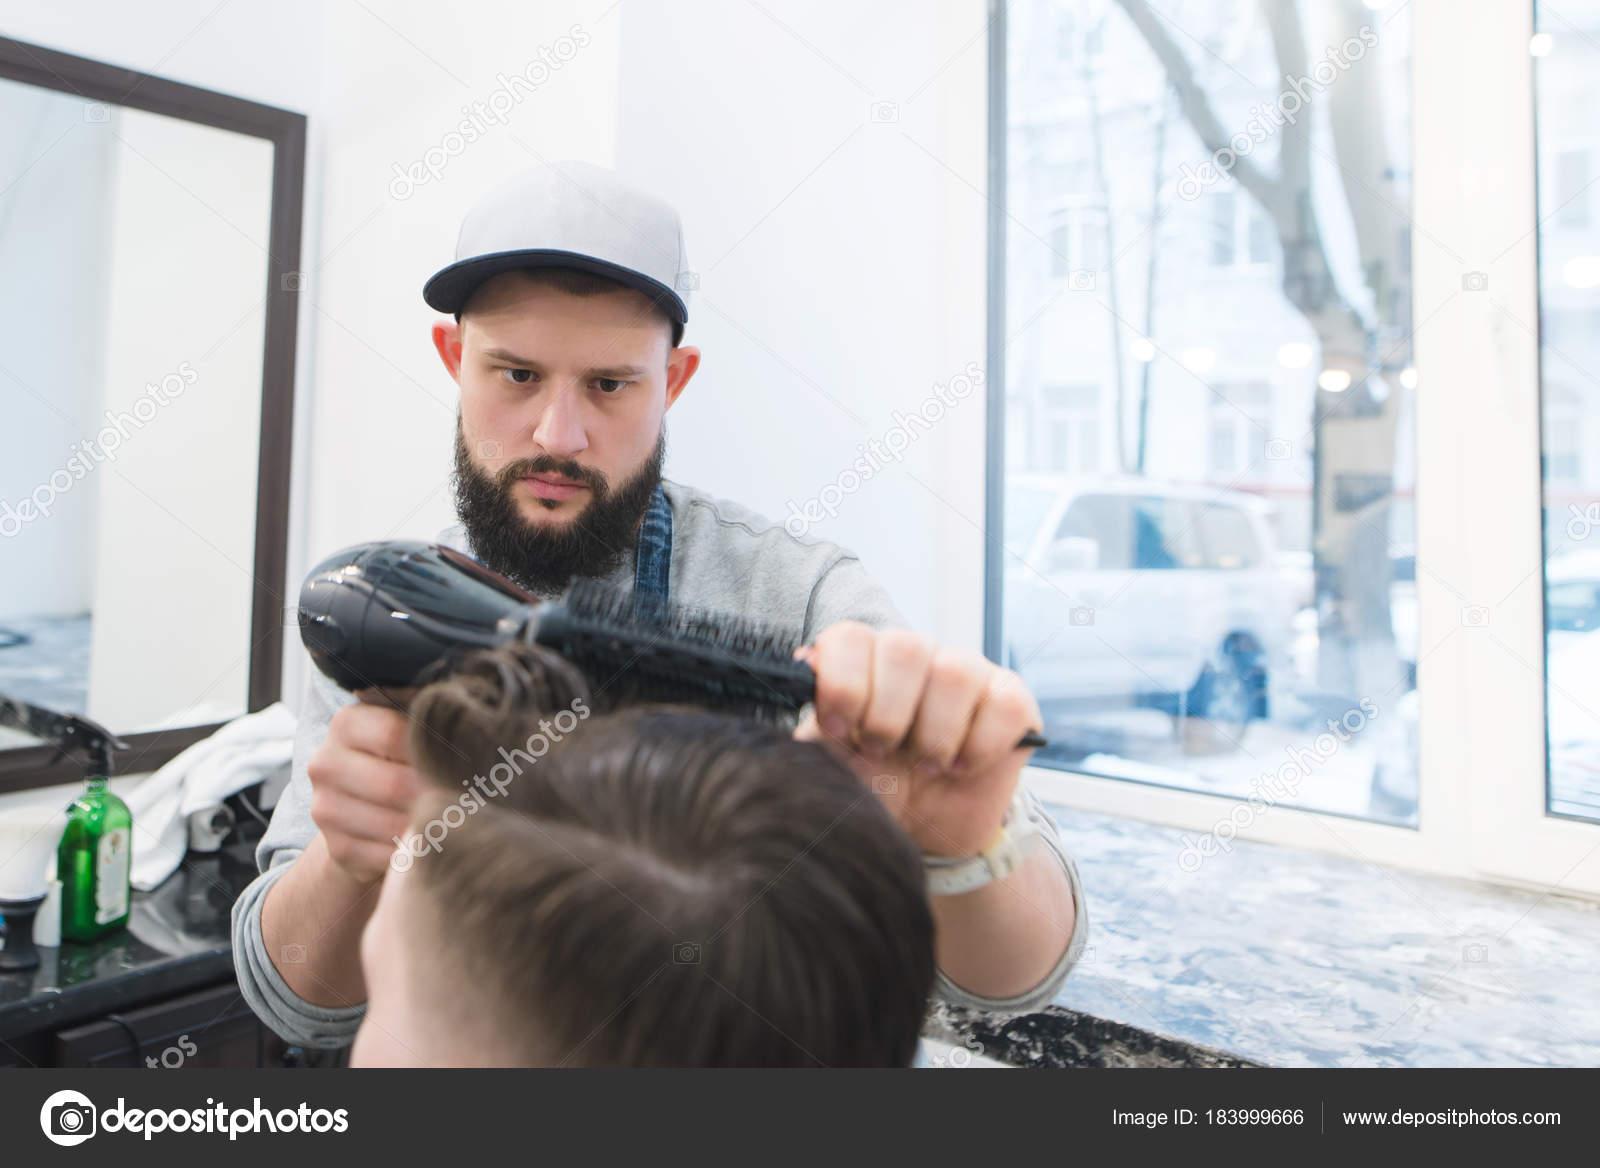 depositphotos_183999666-stock-photo-a-serious-barber-with-a.jpg